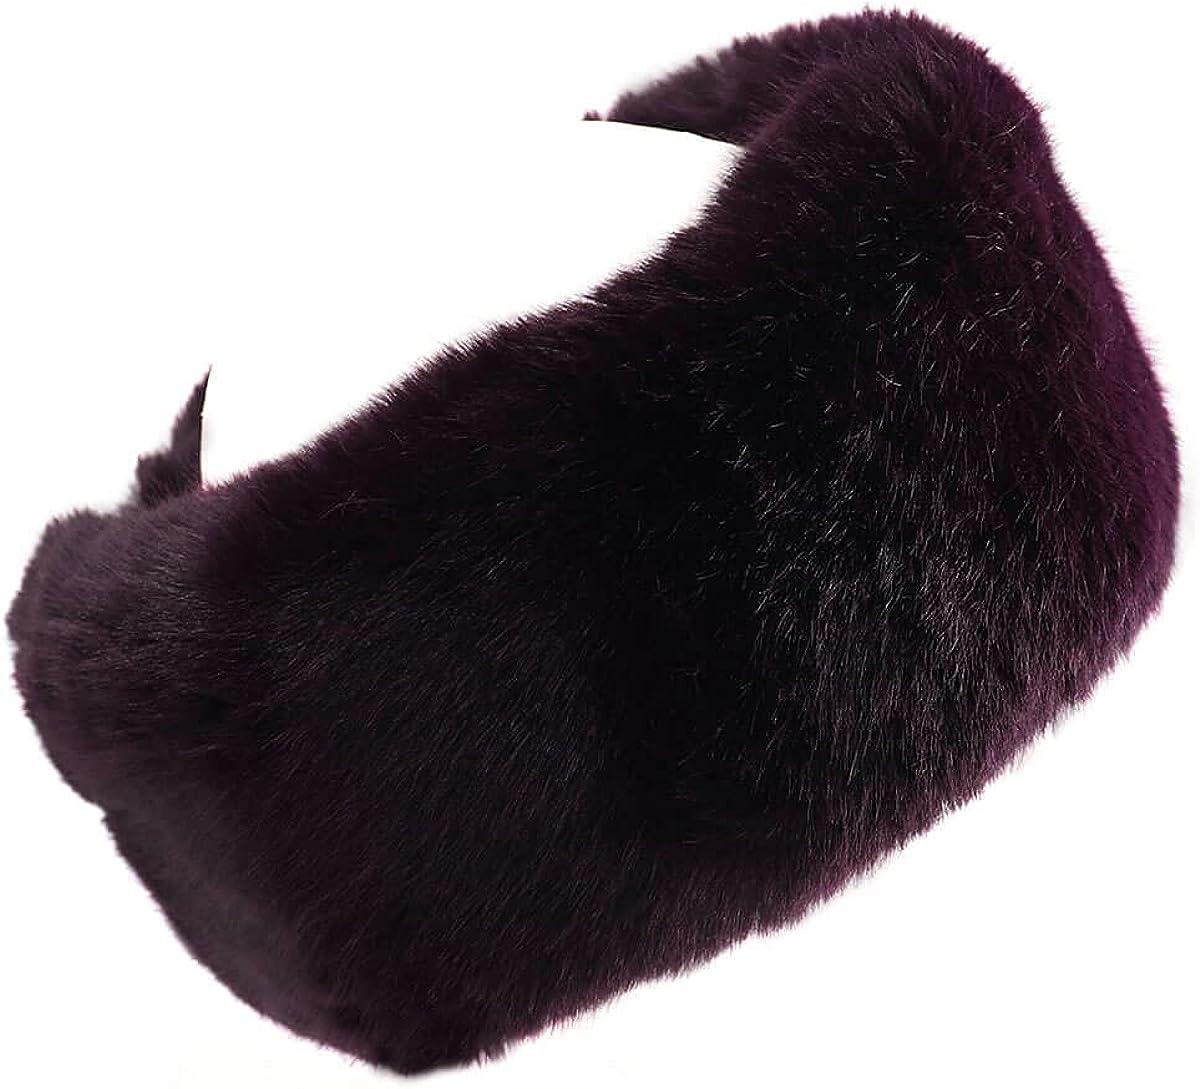 surell Faux Mink Fur Headband Scarf - Ear Warmer and Neckwear (Dark Wine)